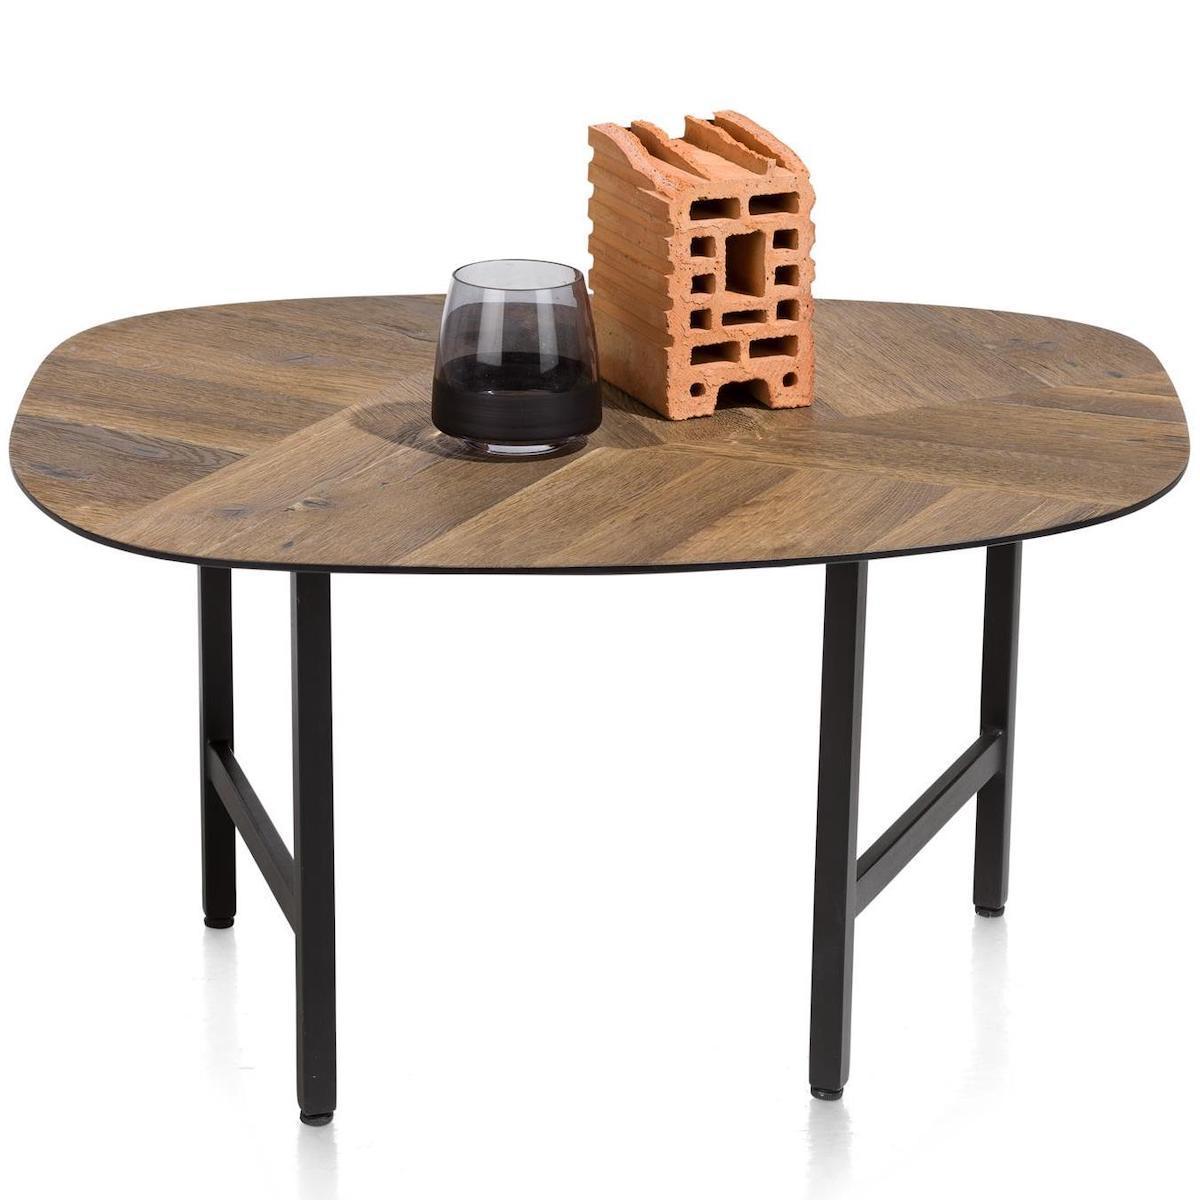 Table basse 70x60cm FRESNO Xooon mosaïque